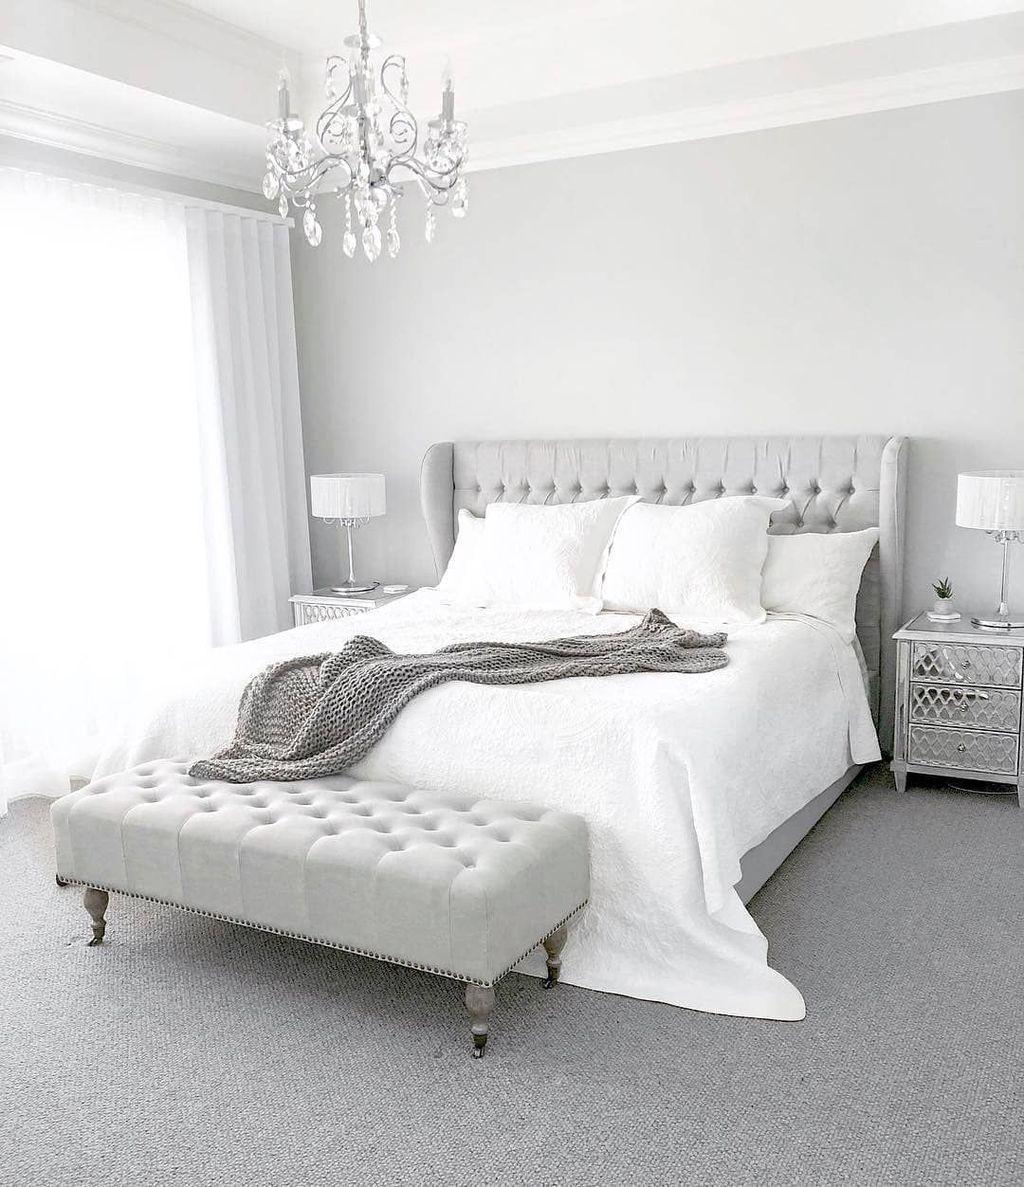 Fabulous White Bedroom Ideas To Make Your Sleep Comfortable 31